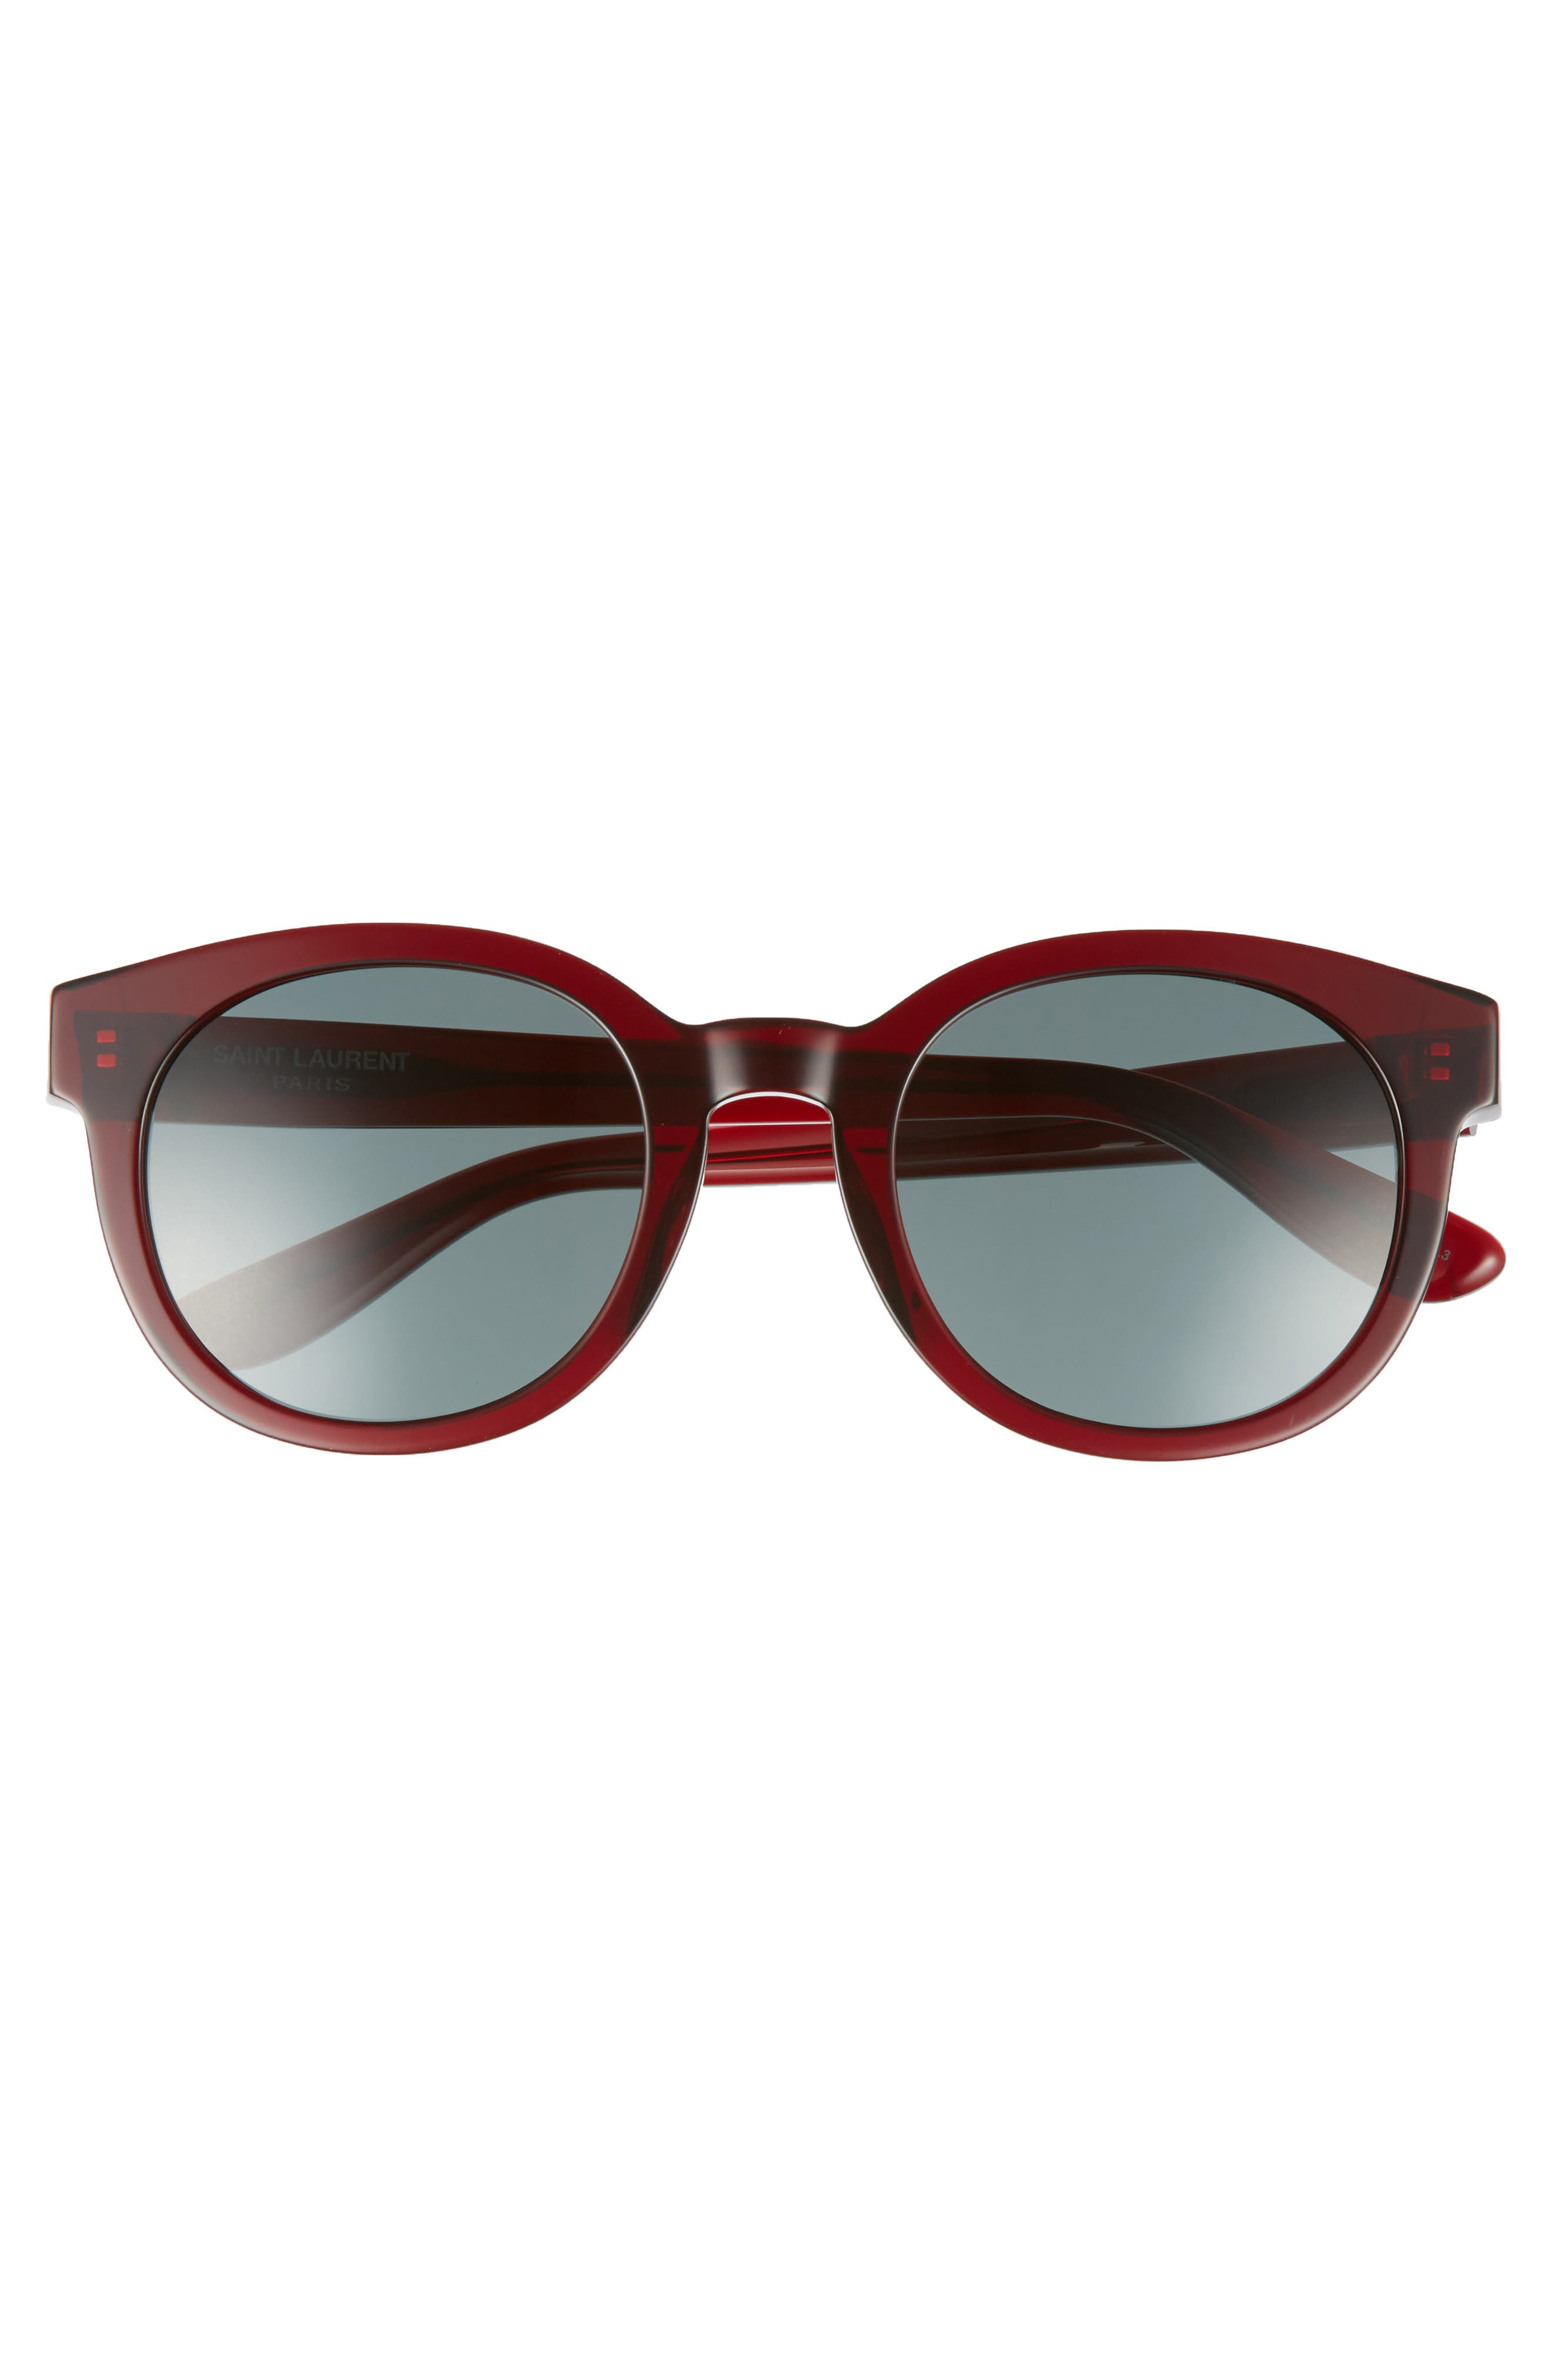 51mm Round Sunglasses,                             Alternate thumbnail 3, color,                             Burgundy